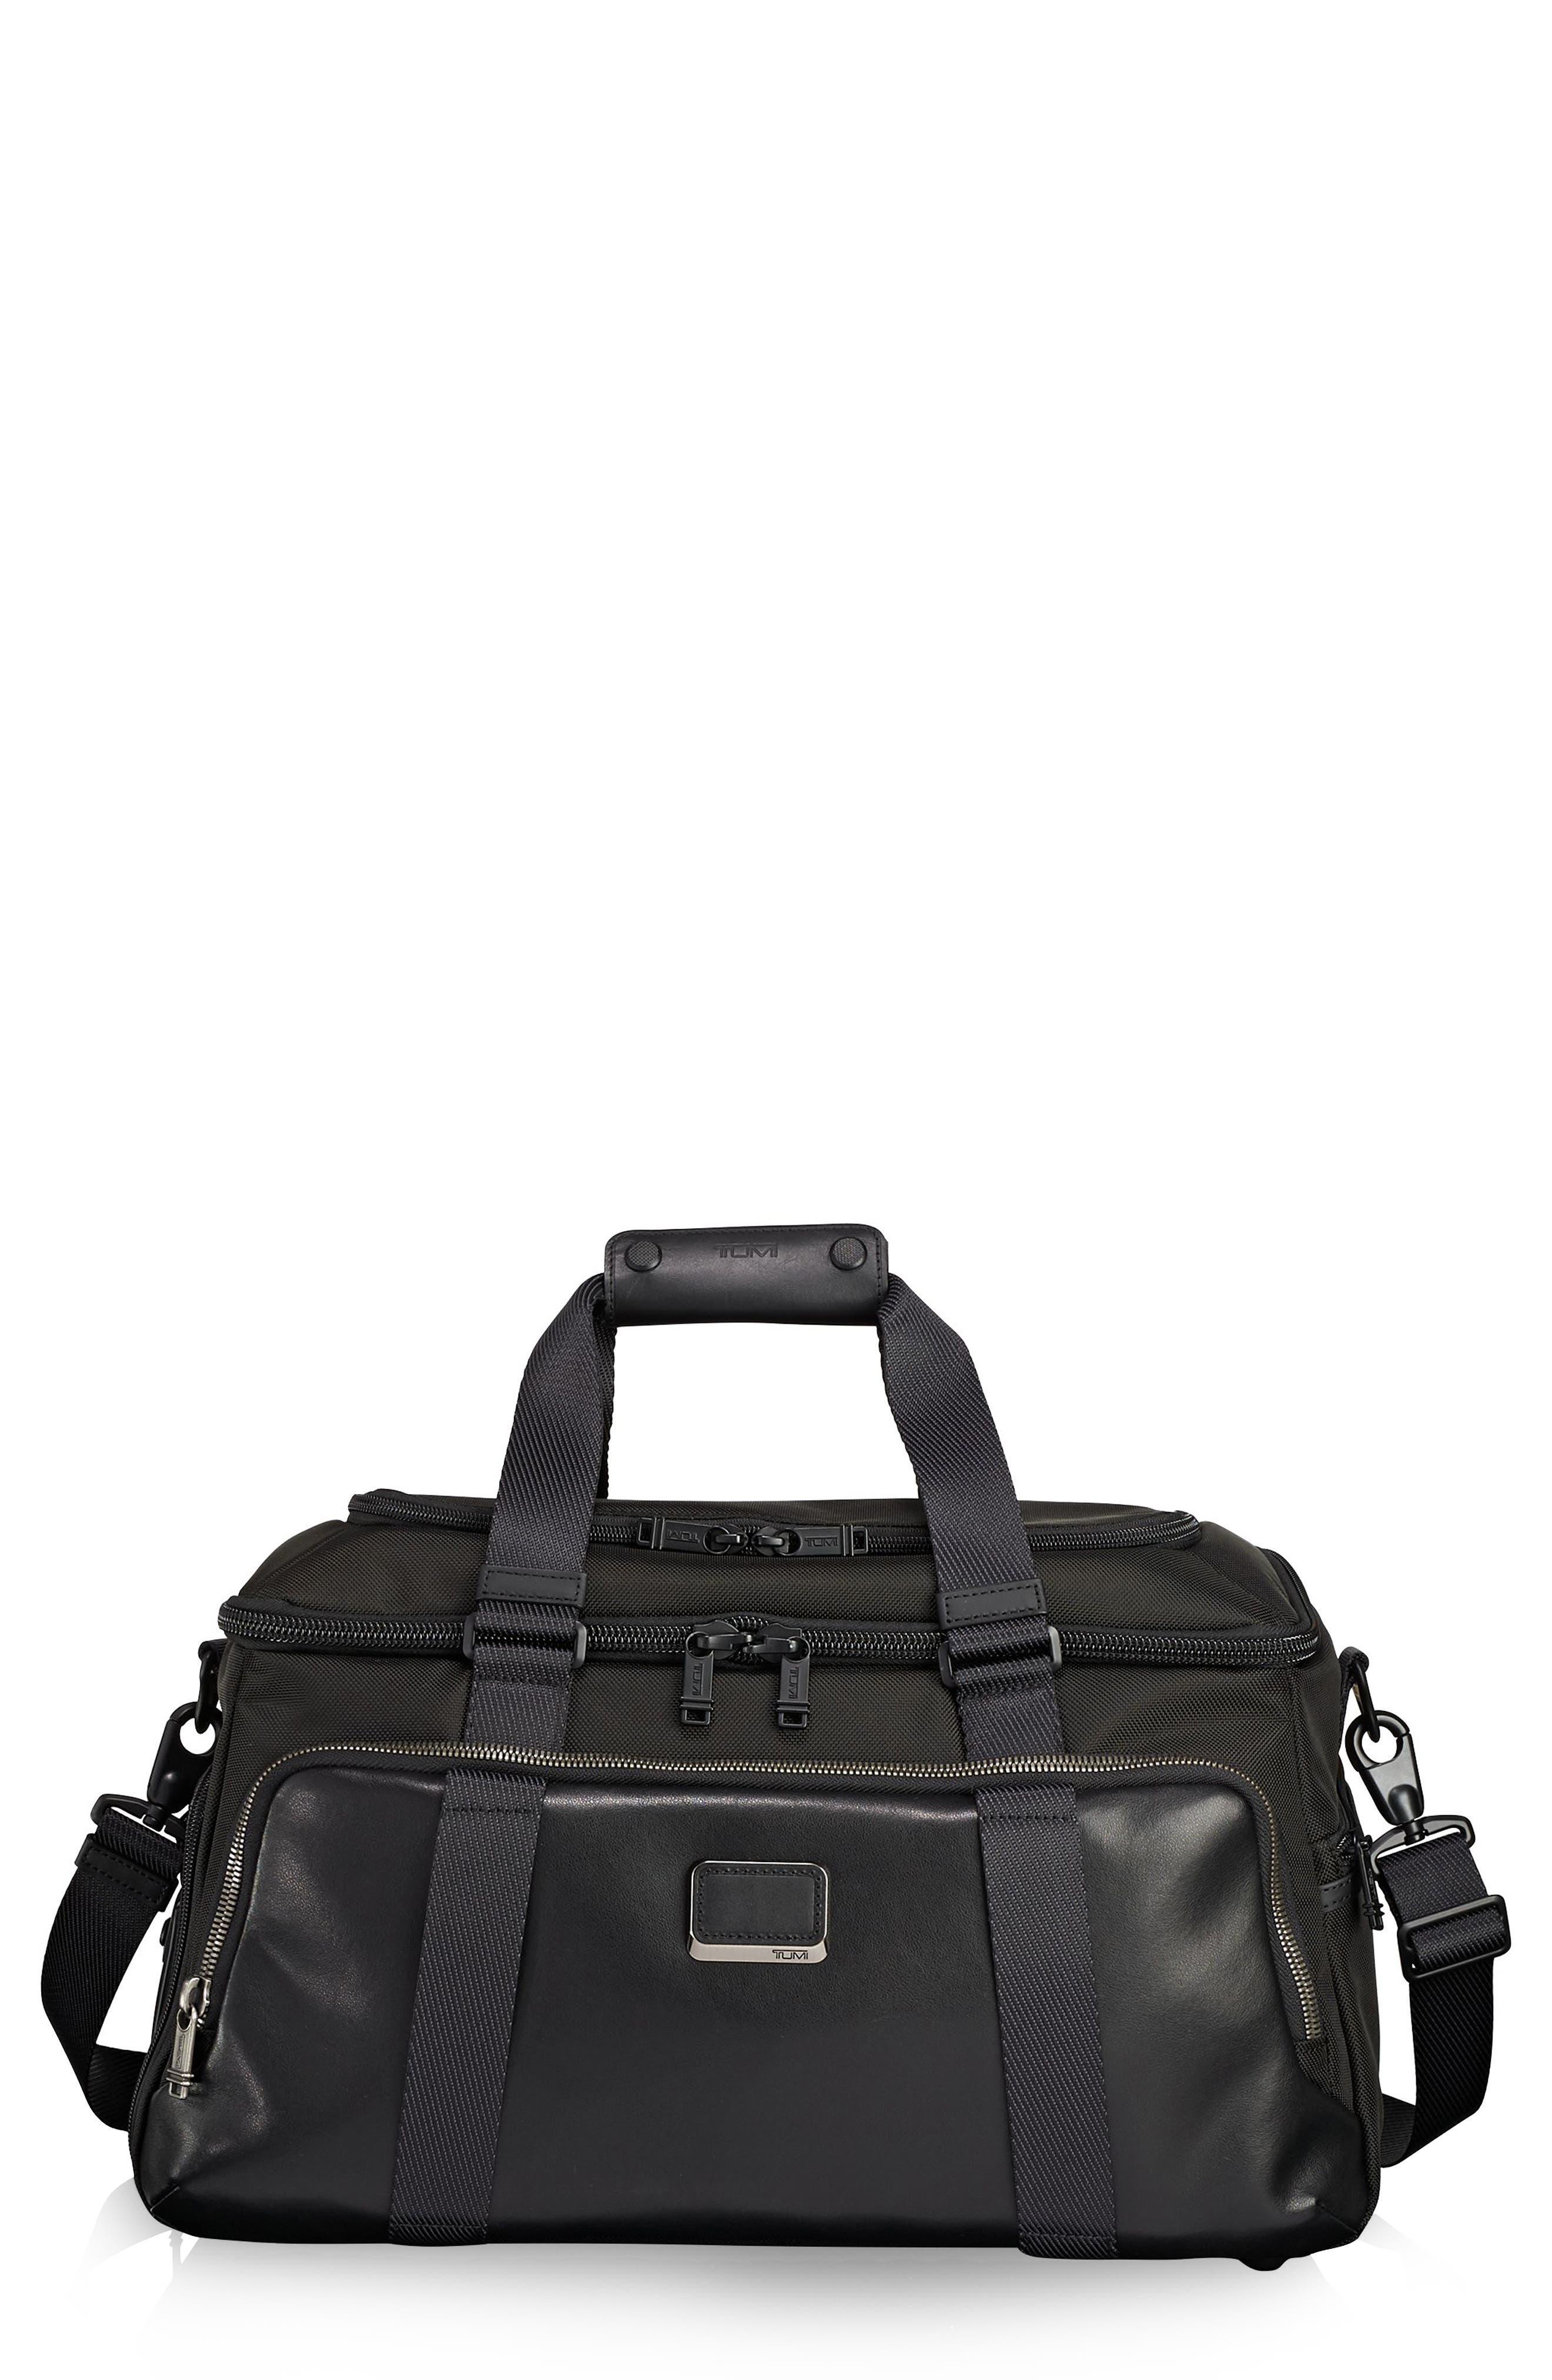 Alpha Bravo - McCoy Duffel Bag,                         Main,                         color,